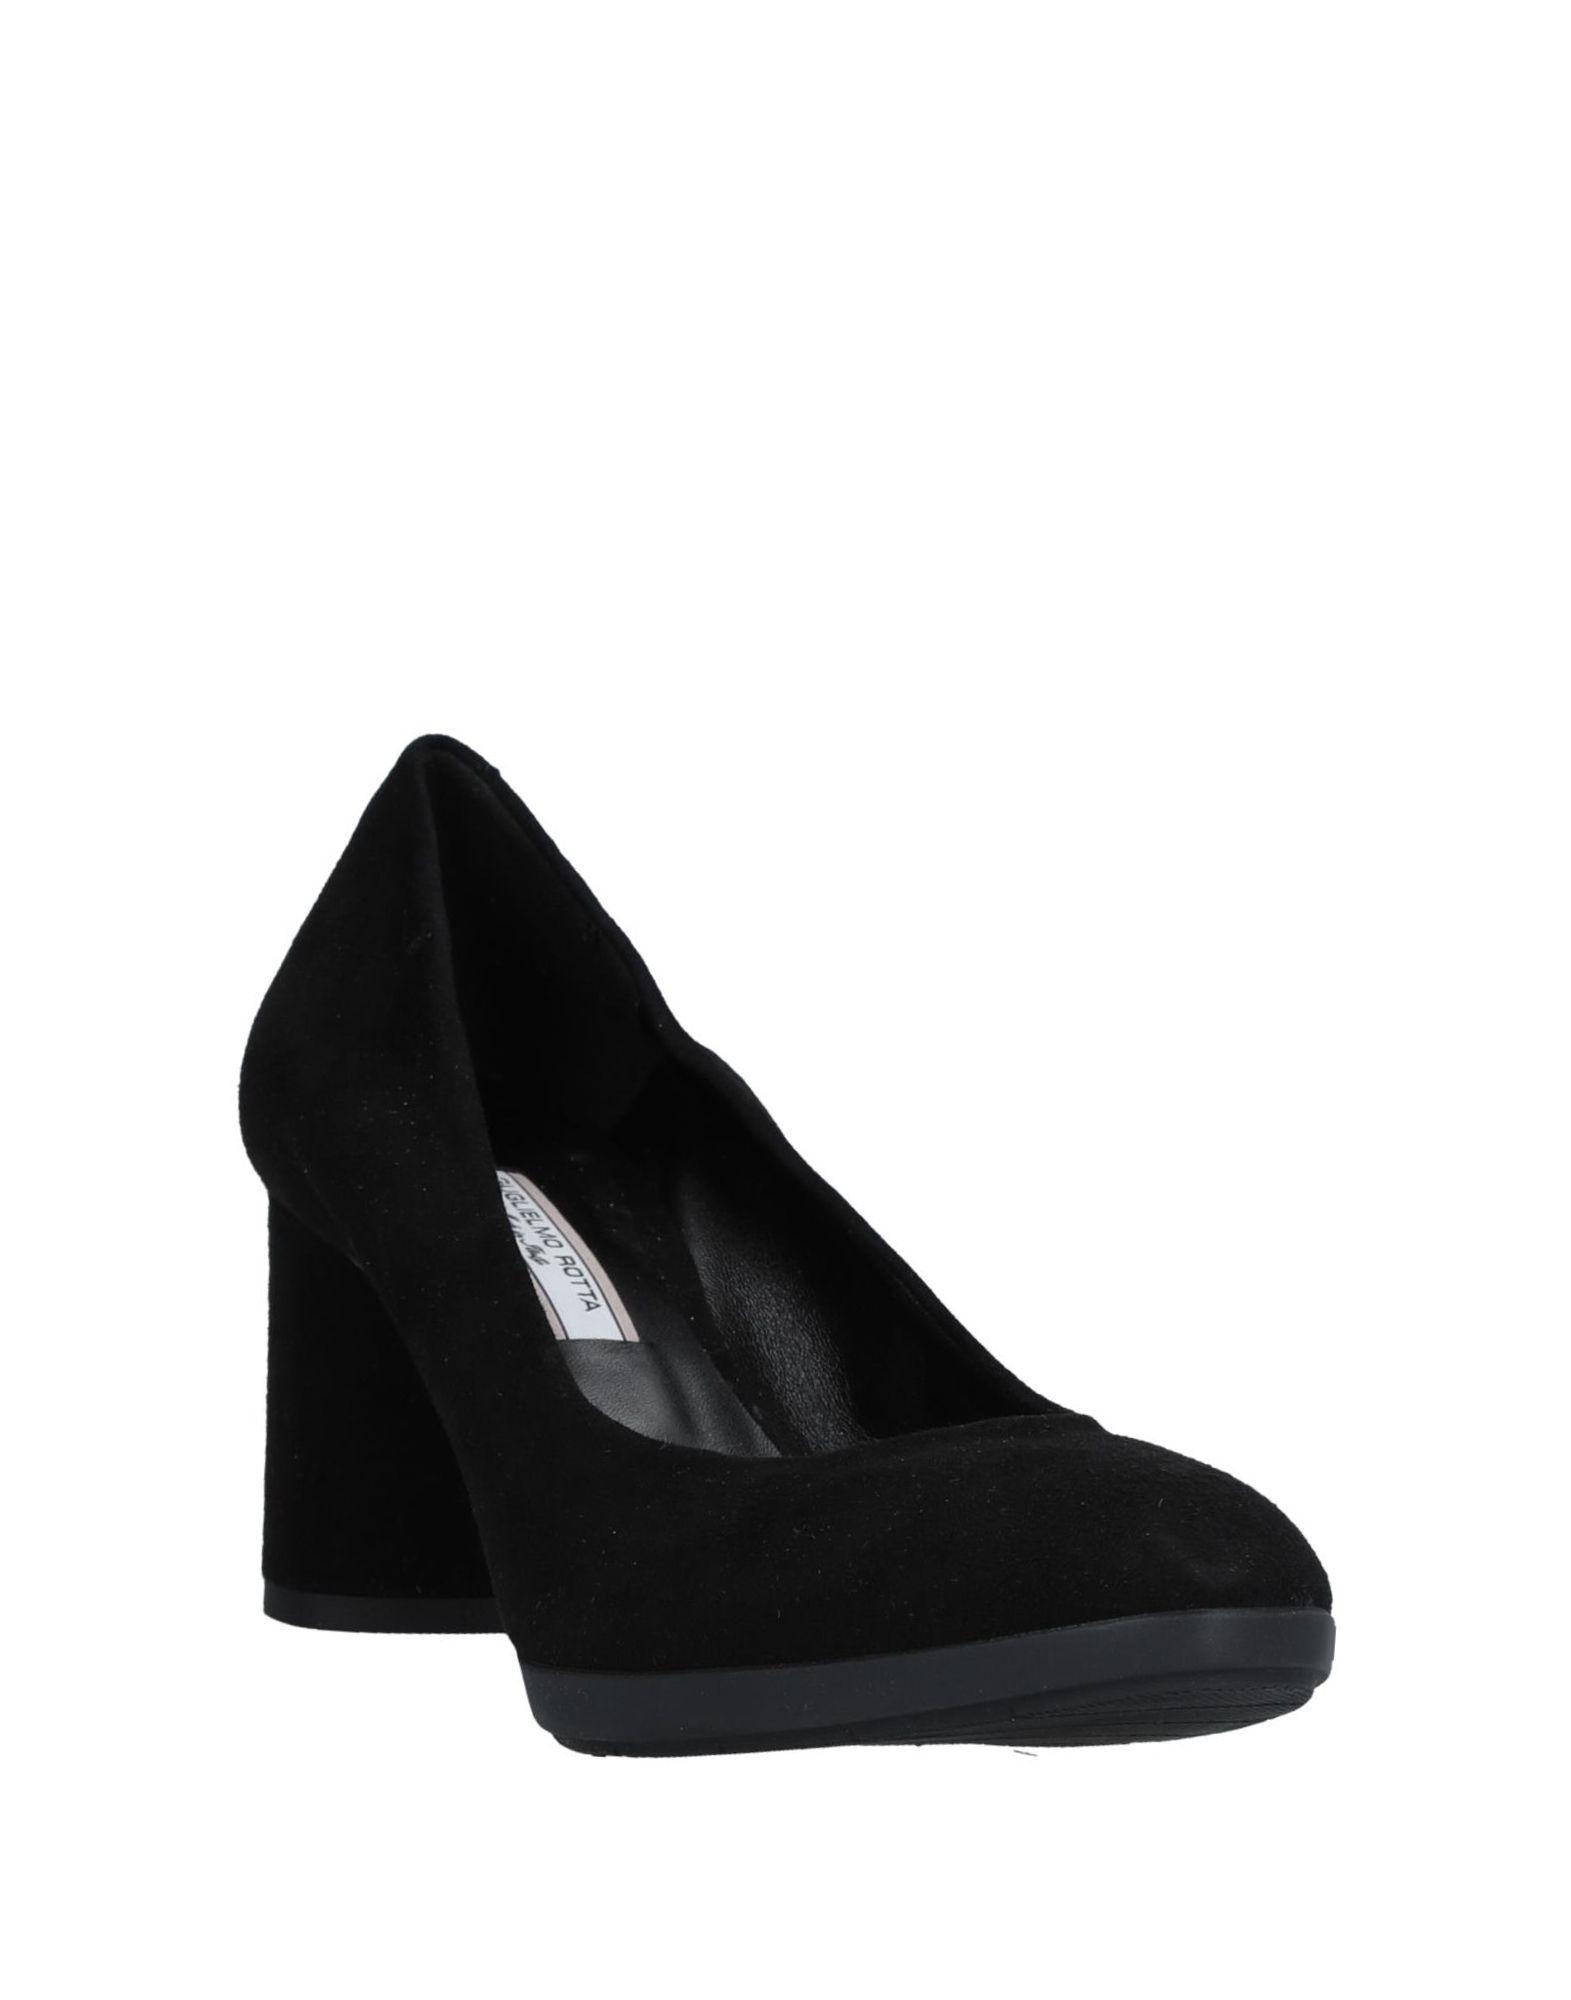 Guglielmo Rotta Pumps Damen  11536131WN Gute Qualität beliebte Schuhe Schuhe Schuhe 440cf7